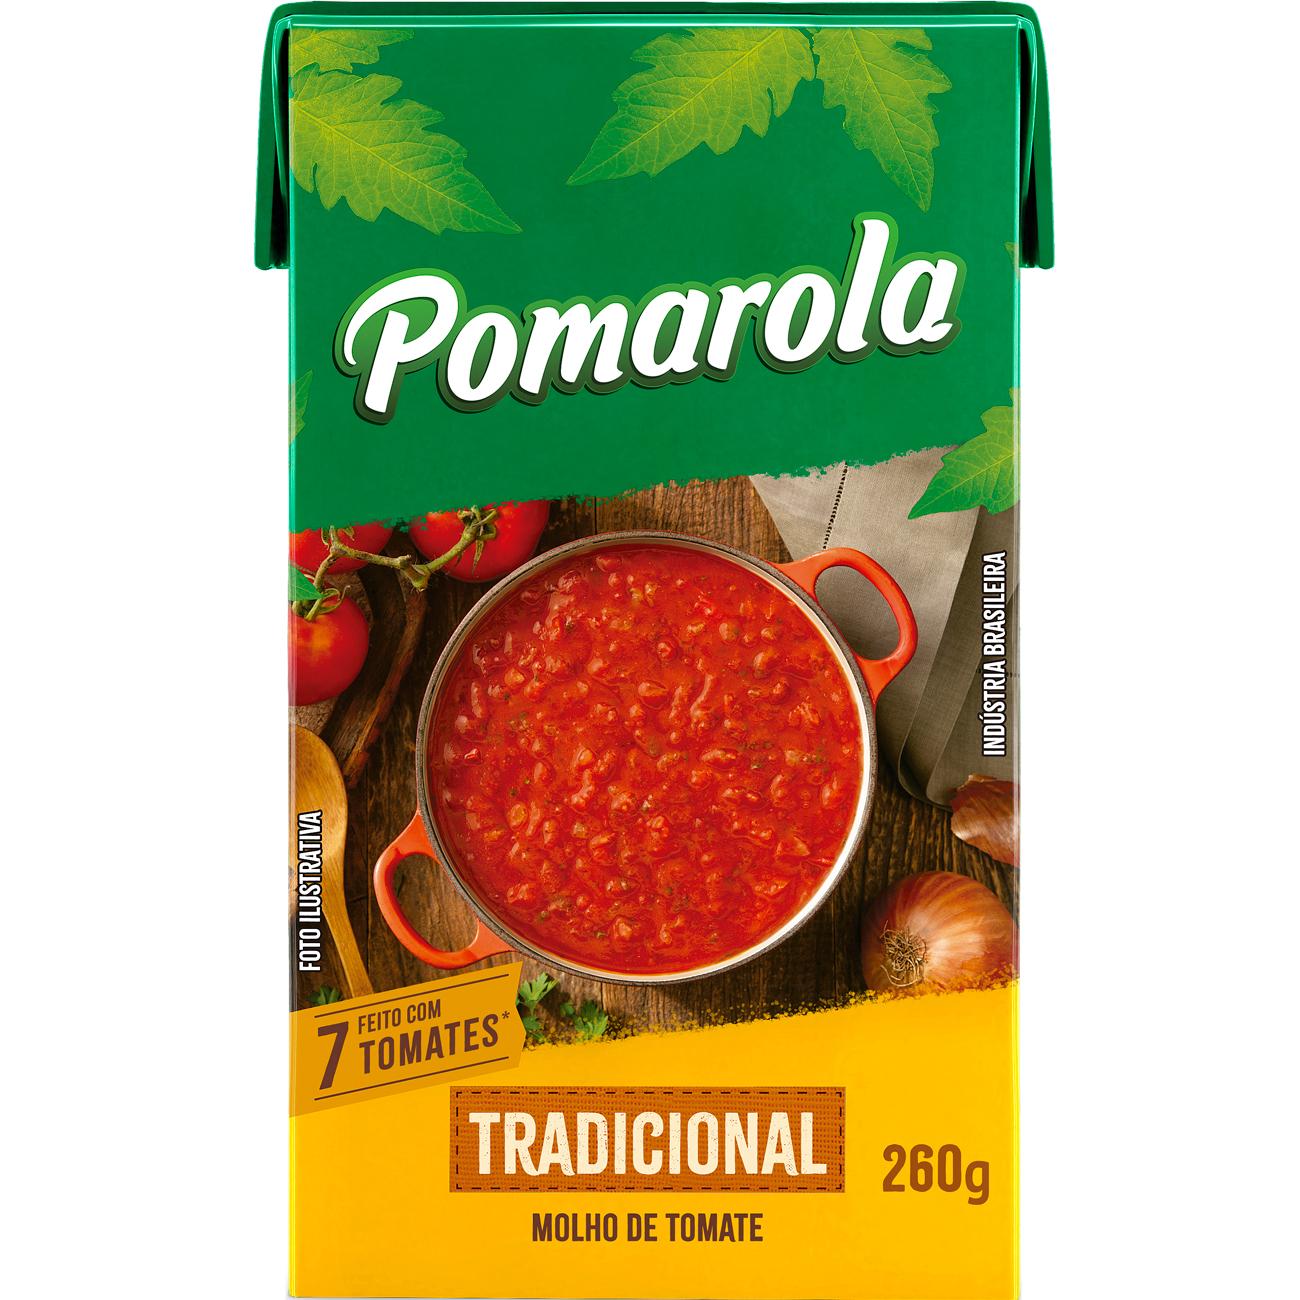 Molho de Tomate Pomarola Tradicional Tetra Pak 260G